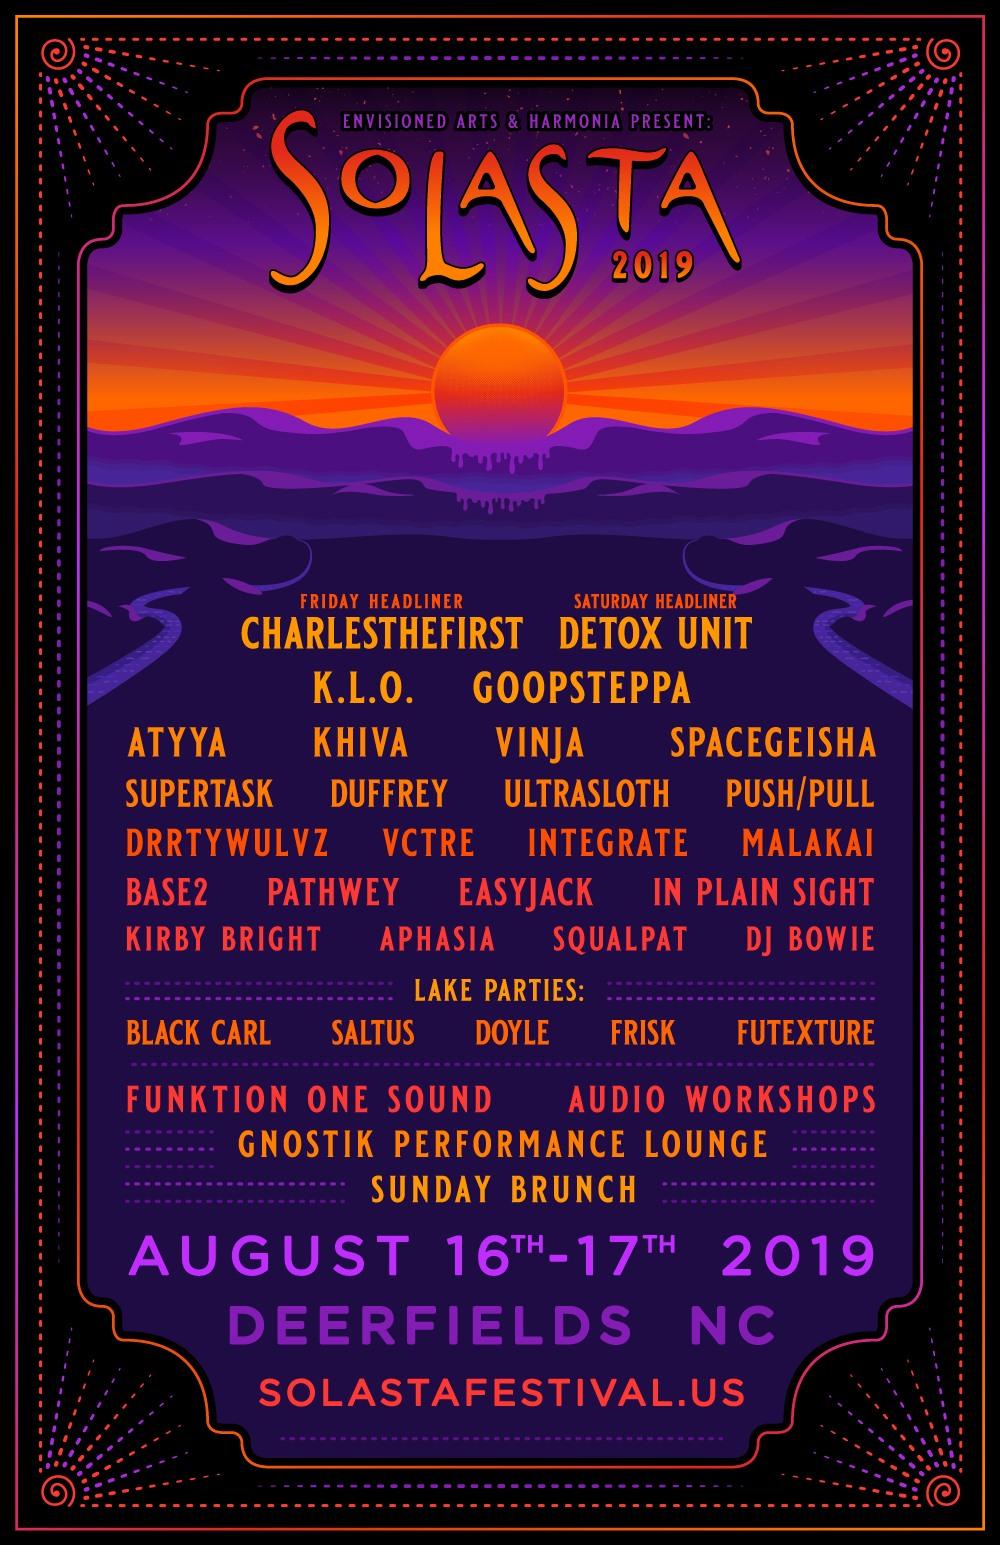 8 August 16 18 2019 Solasta Deerfields NC Atlanta EDM Events Shows Concerts Festivals.jpg